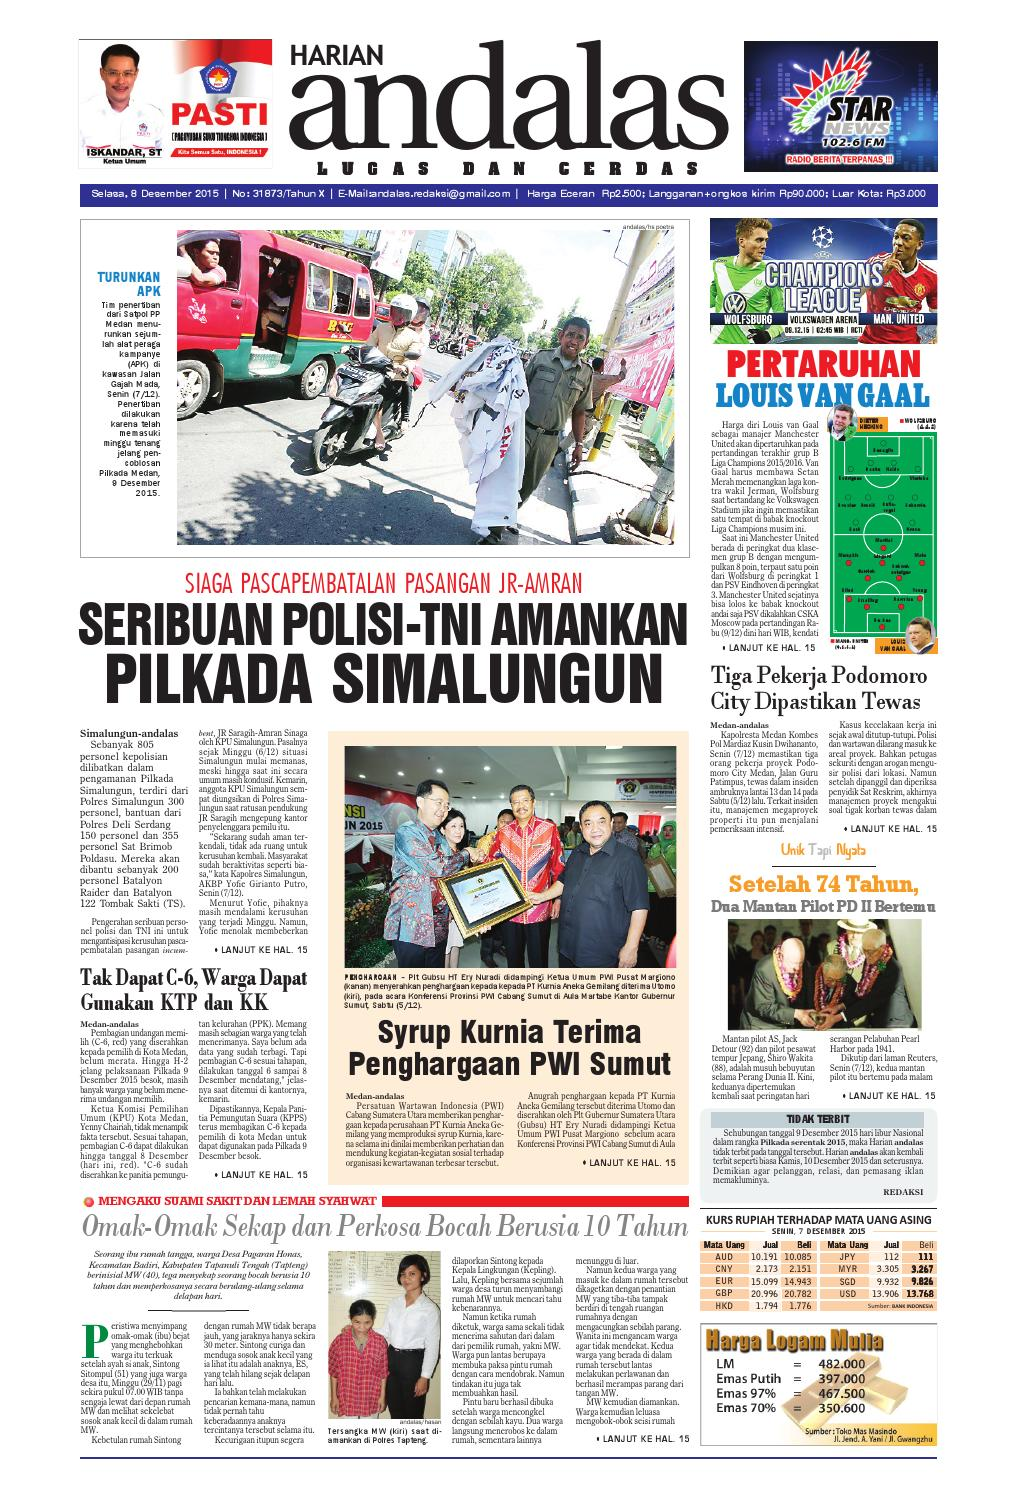 Epaper andalas edisi selasa 8 desember 2015 by media andalas - issuu 57a061b873